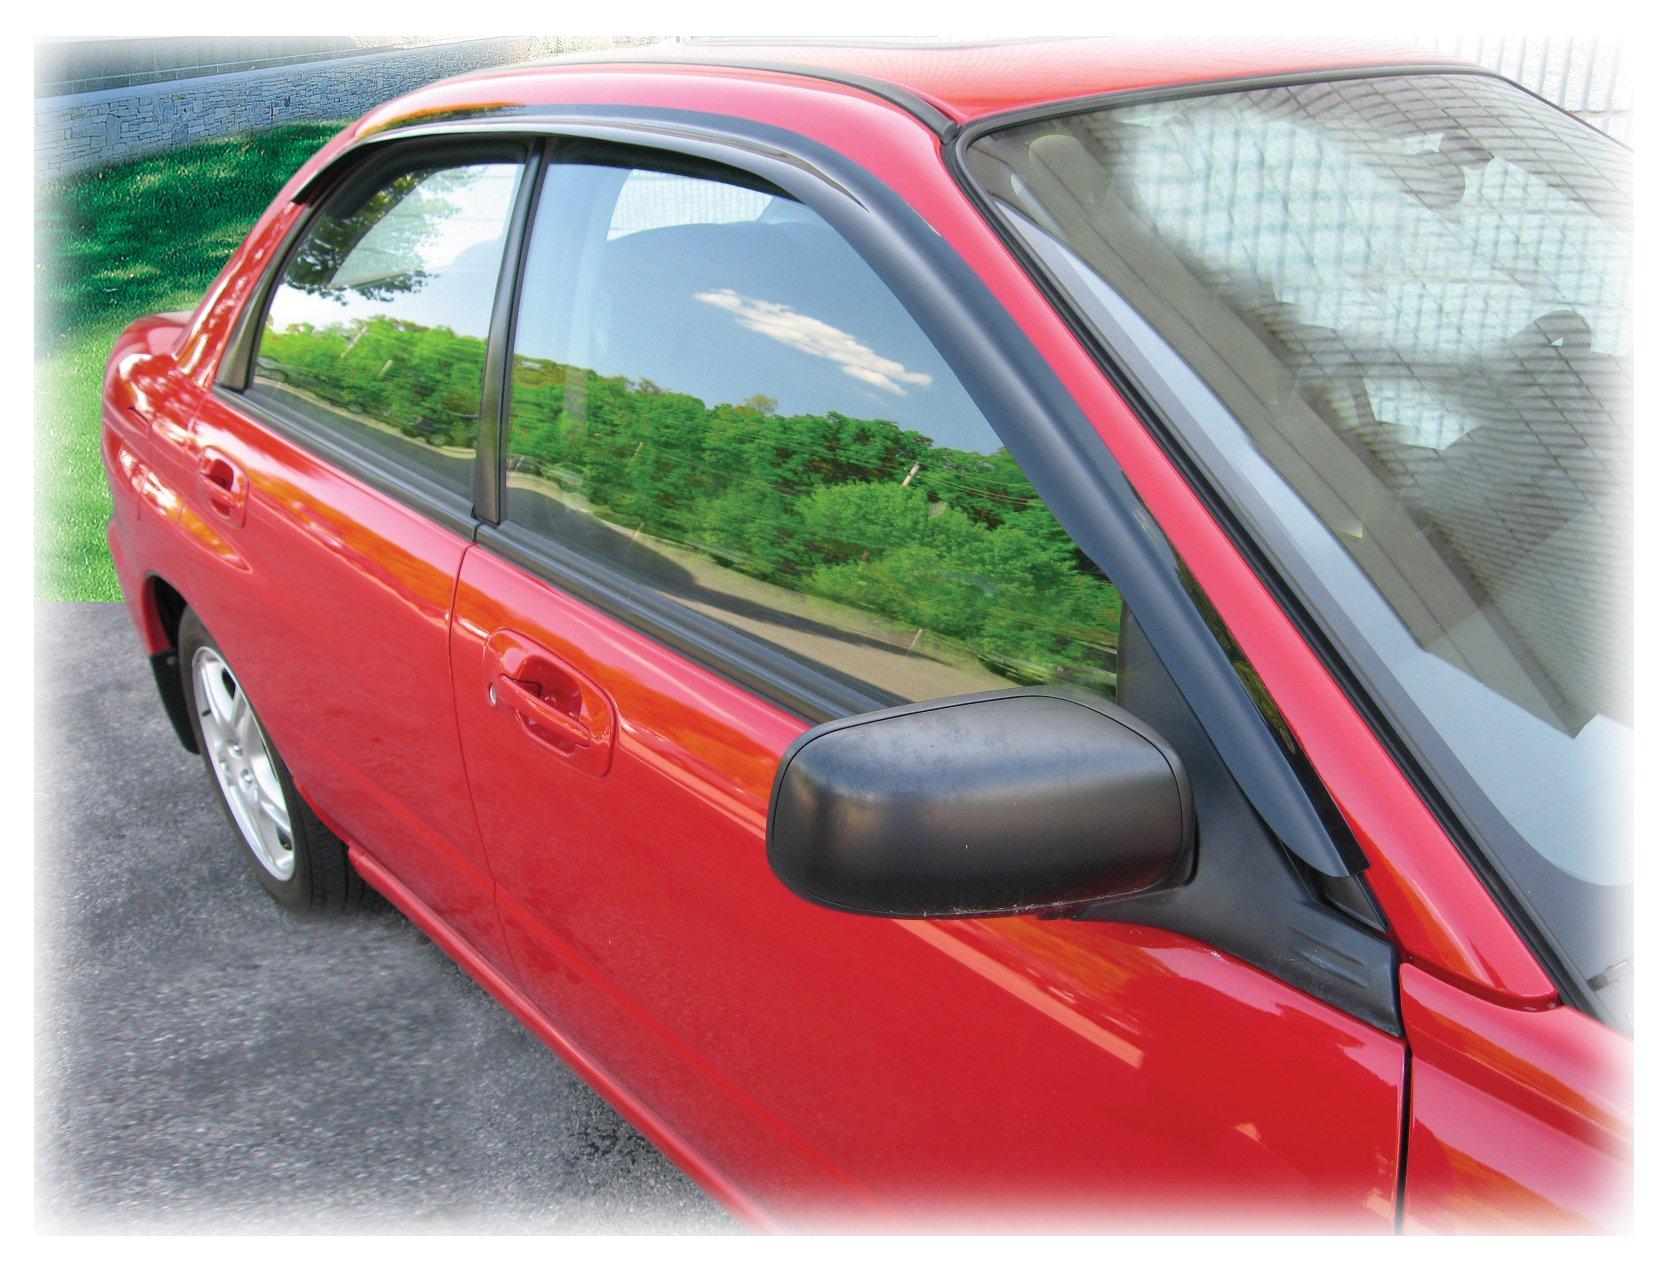 C&C Car Worx WV-02I-T Set of 2 Tape-On Window Visor Rain Guard Deflectors fit 2002-2007 Subaru Impreza Sedan & Hatchback, Impreza WRX and STI